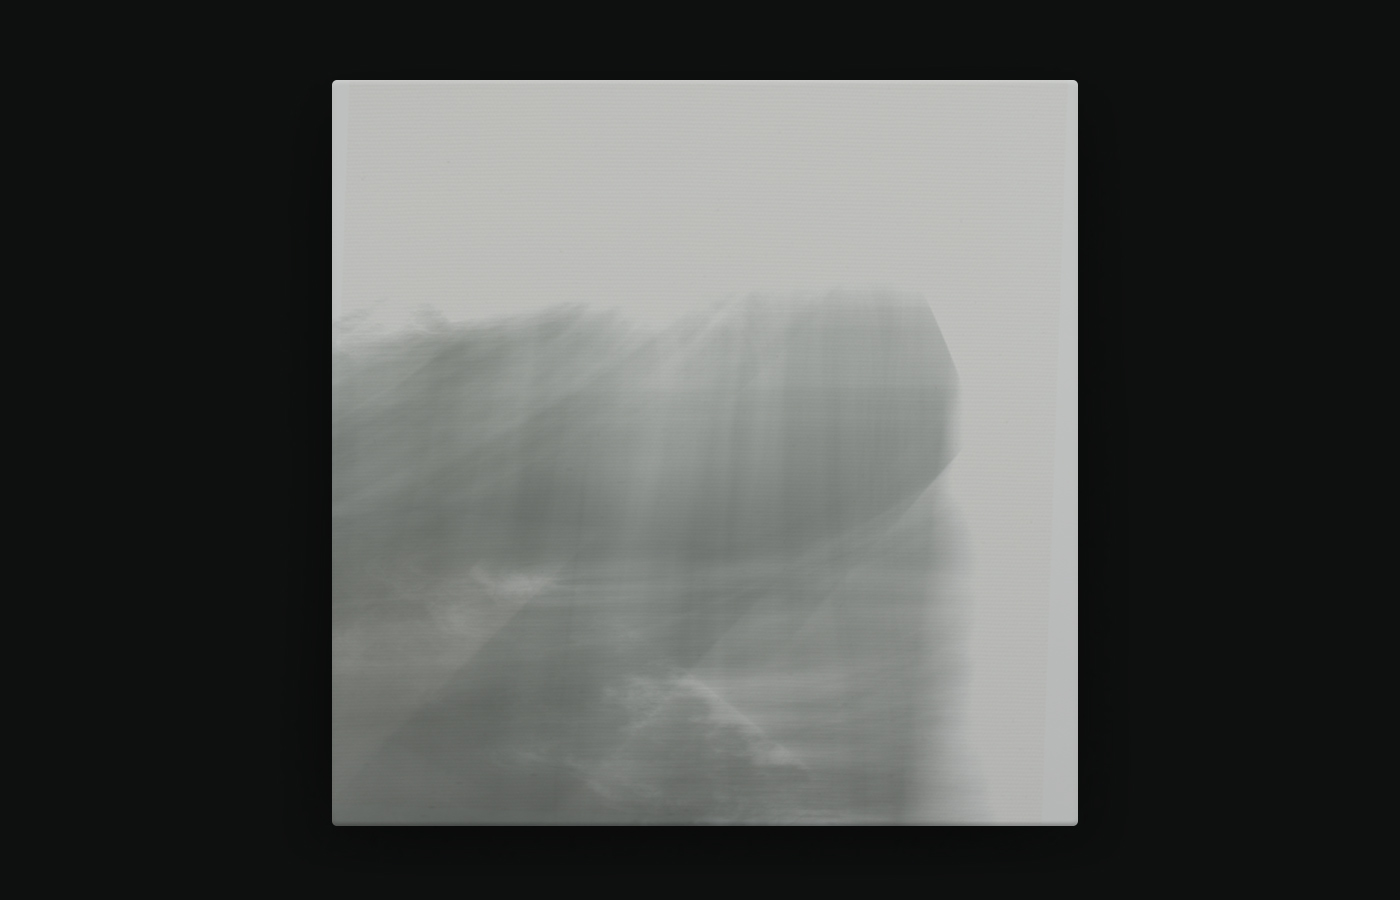 graphic art textures experiments